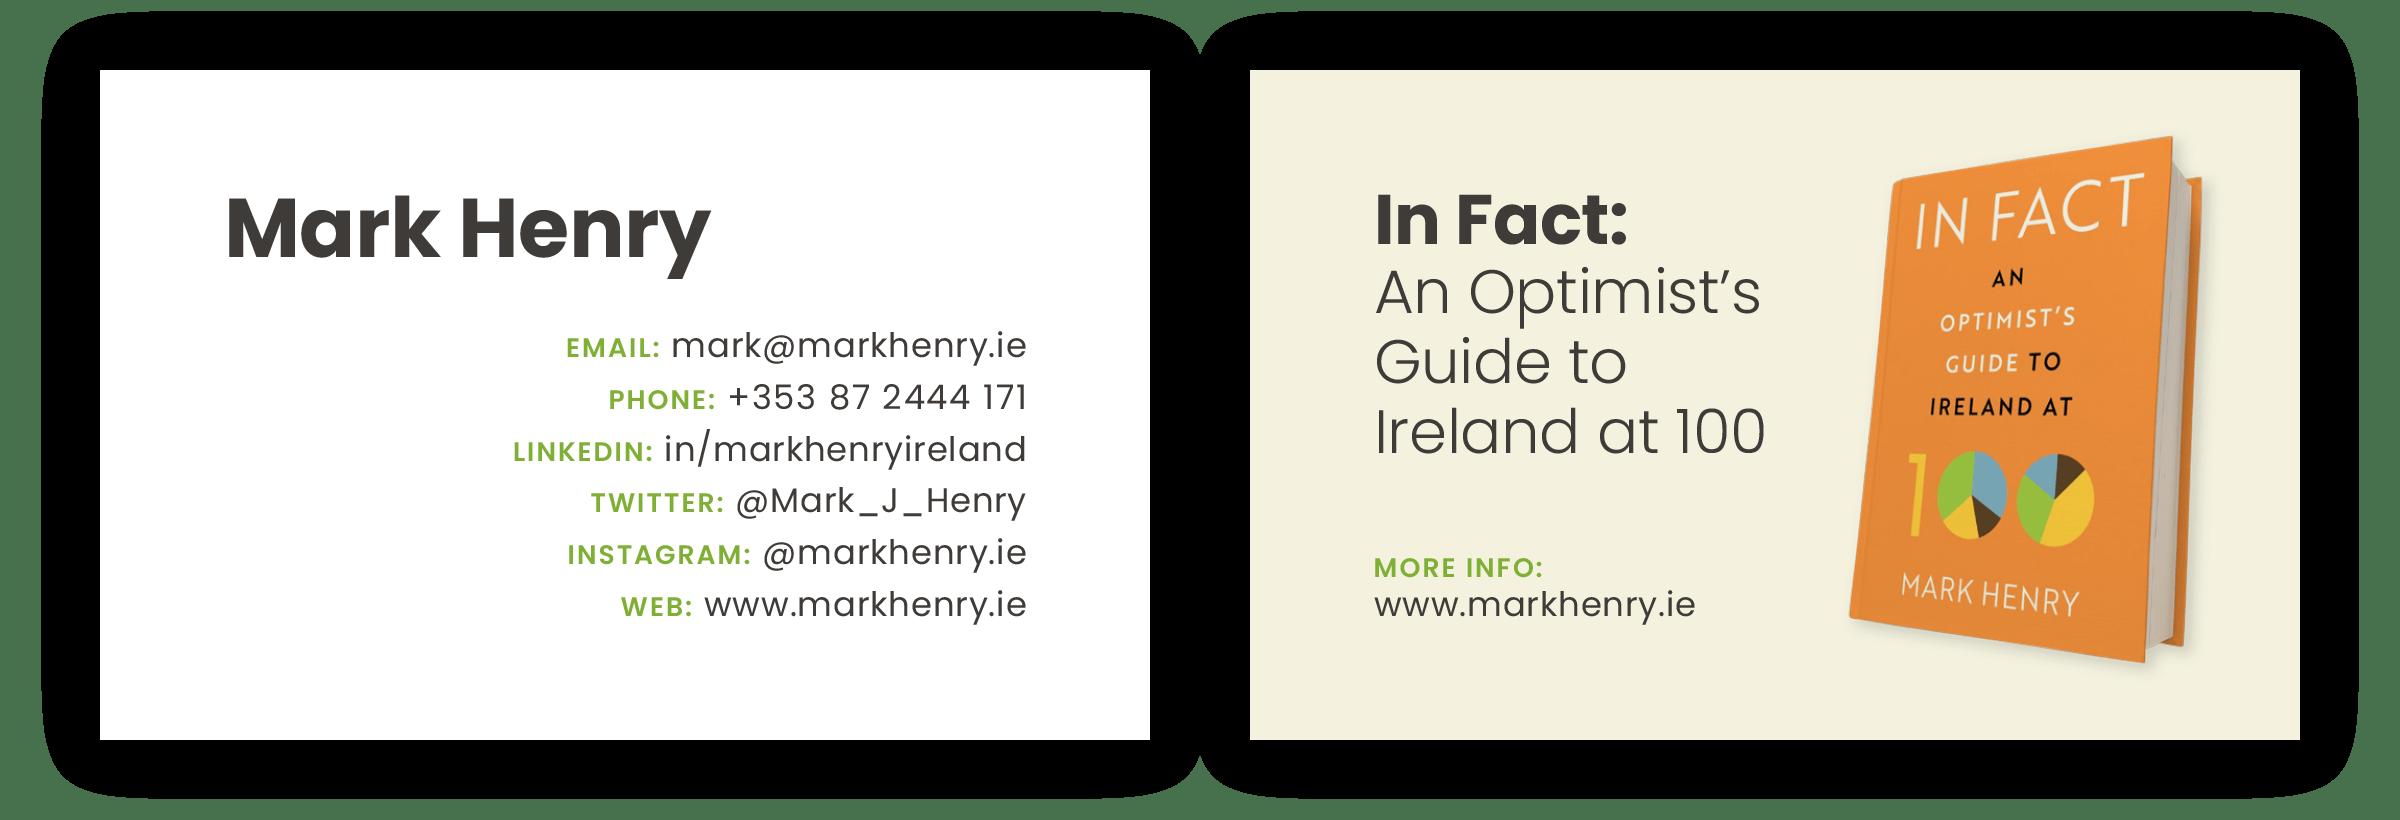 Mark Henry business card